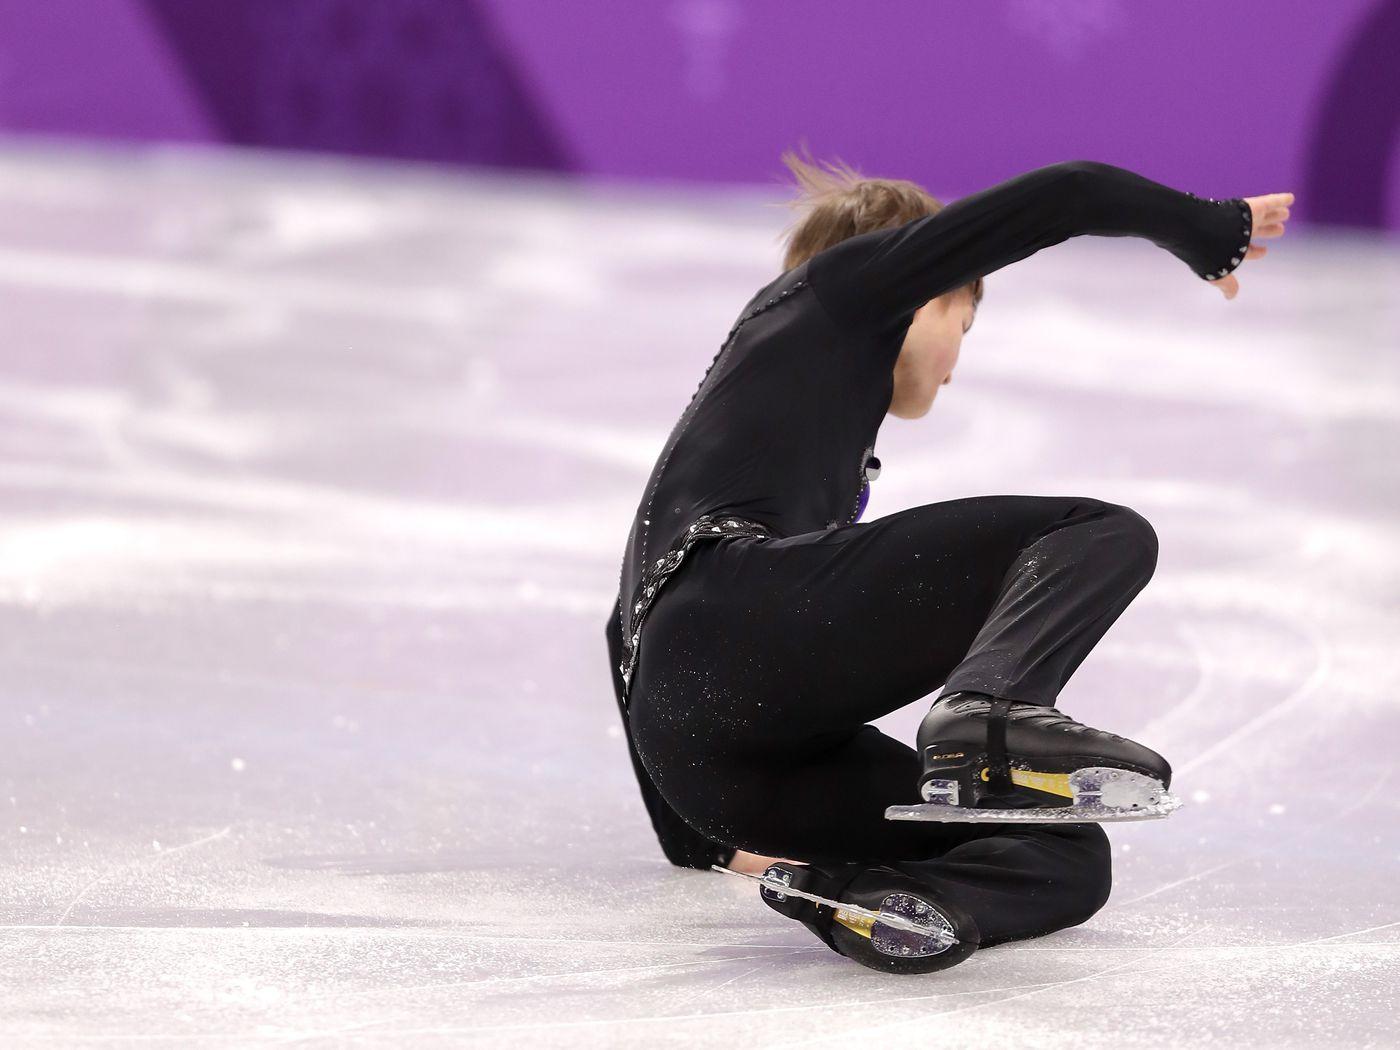 2337225fe0a Winter Olympics 2018: figure skating scoring, explained - Vox